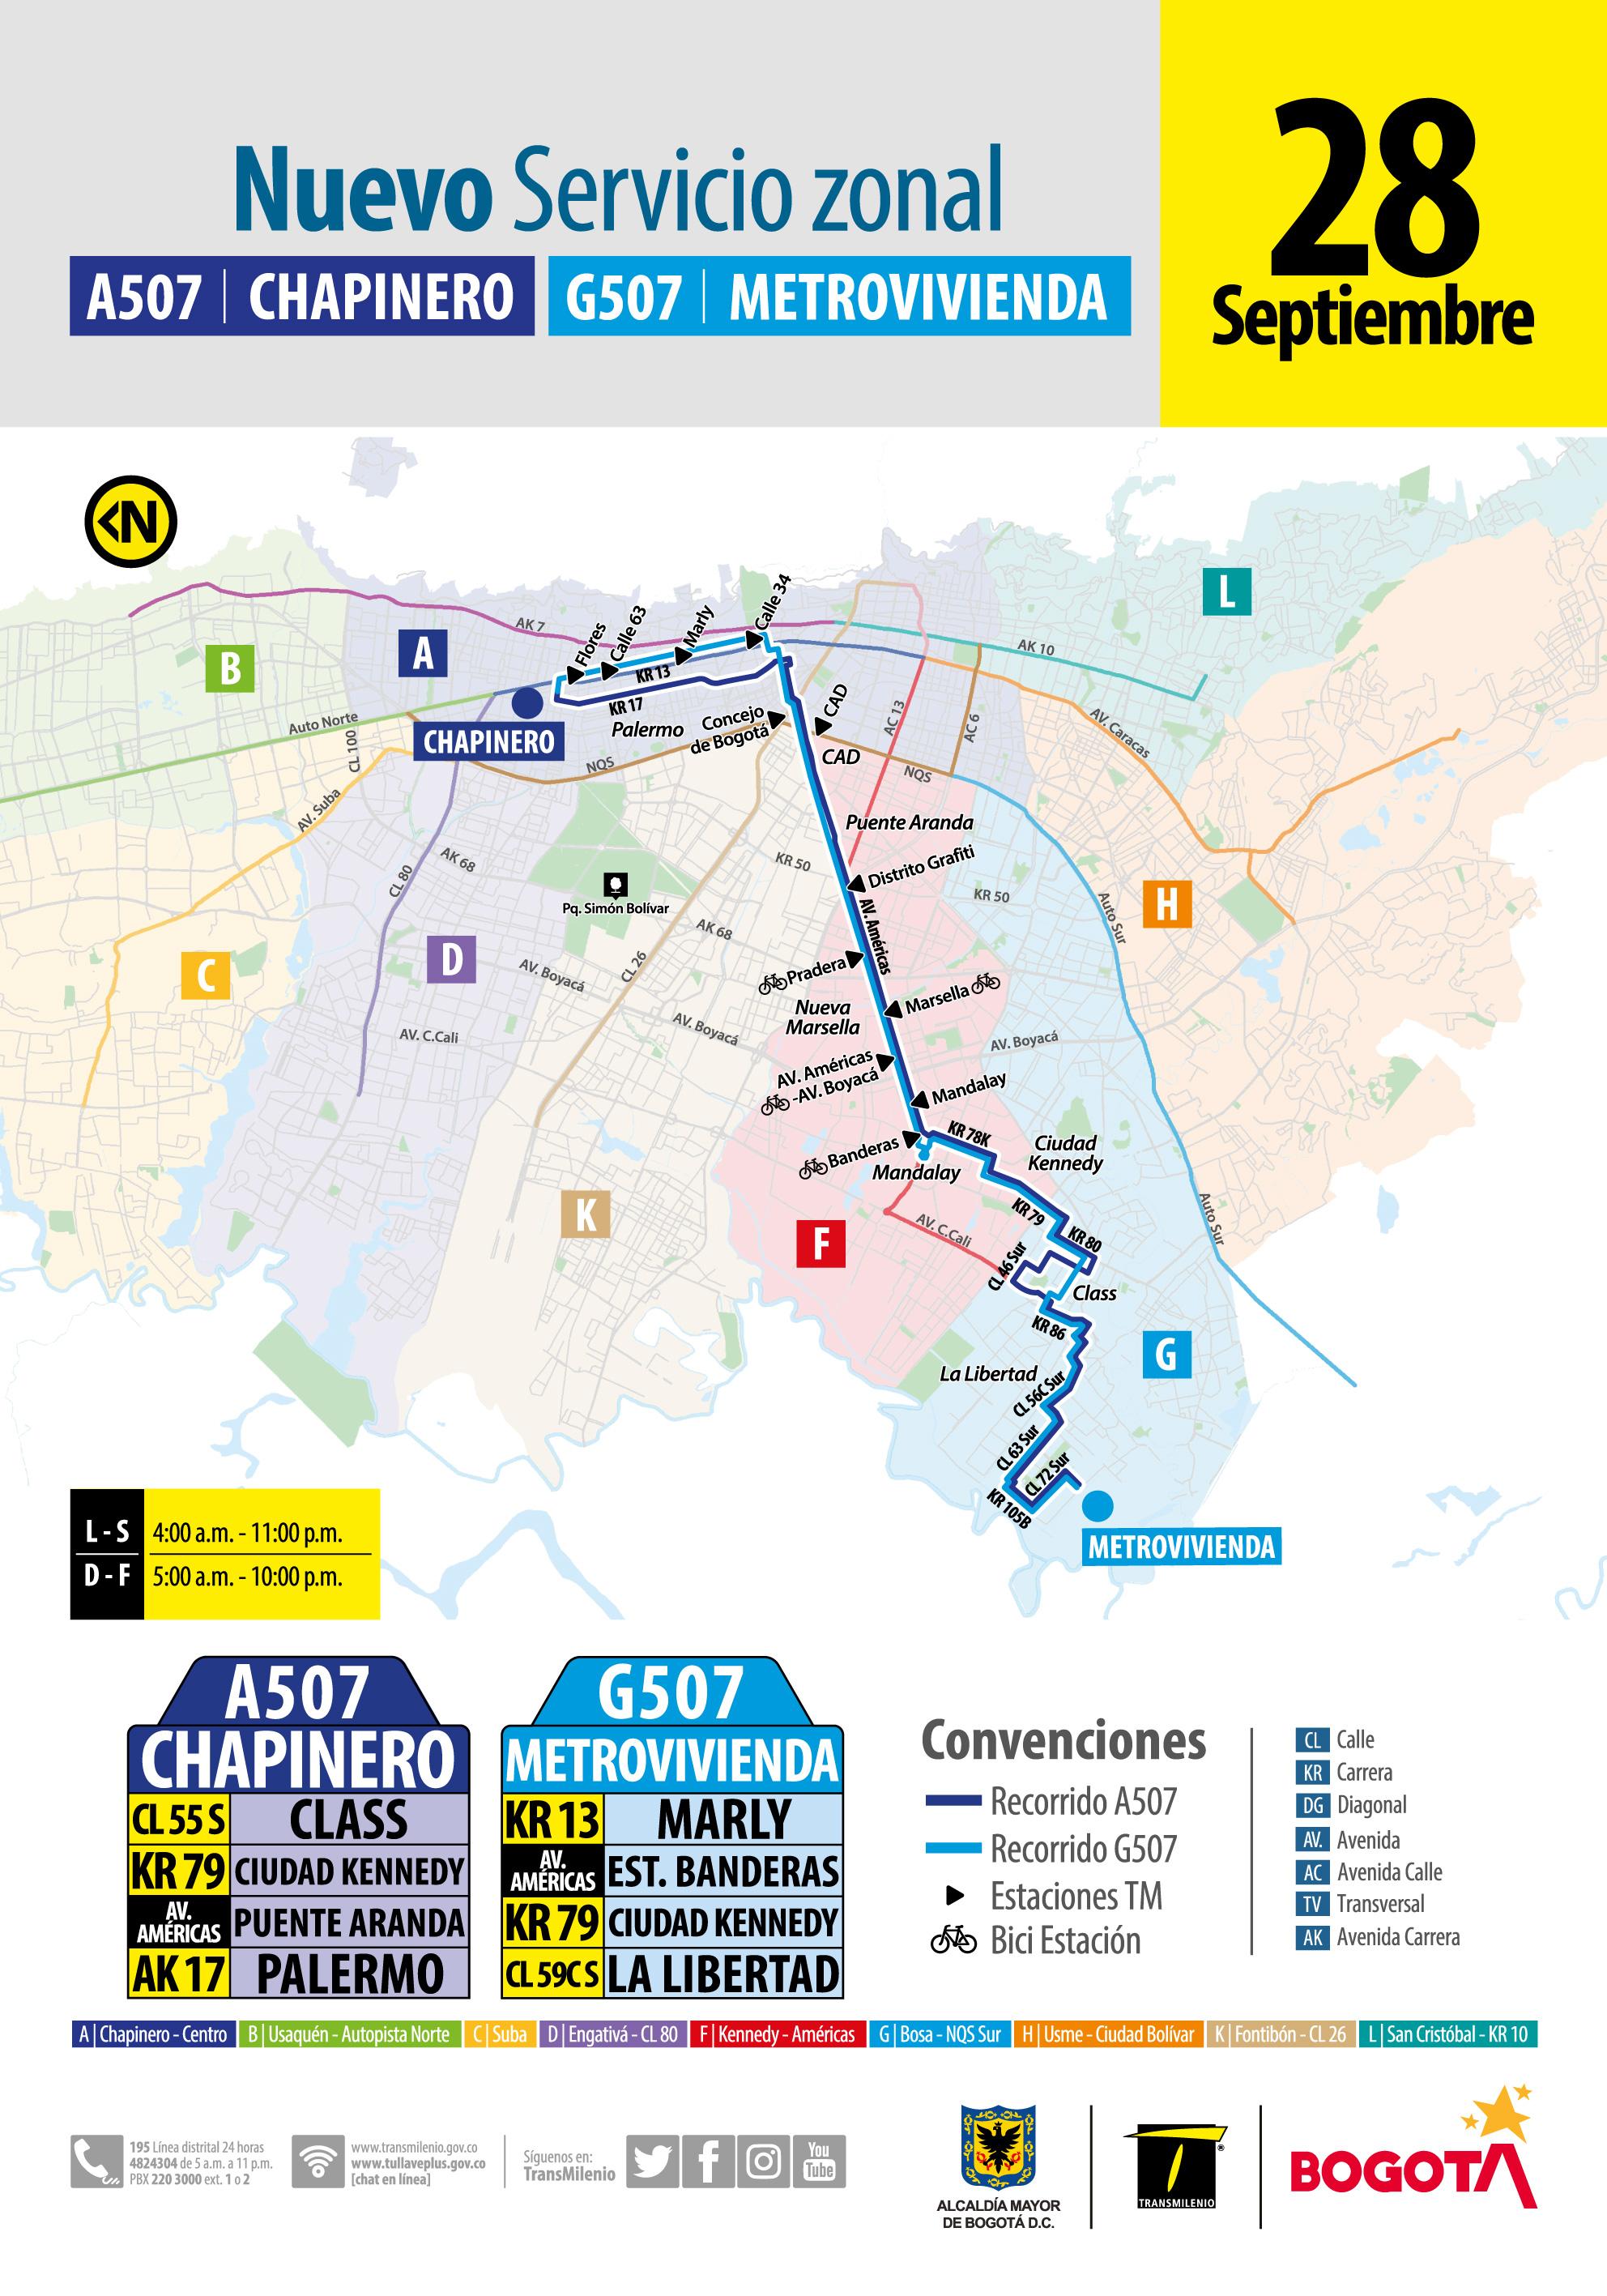 Mapa del servicio zonal A507-G507